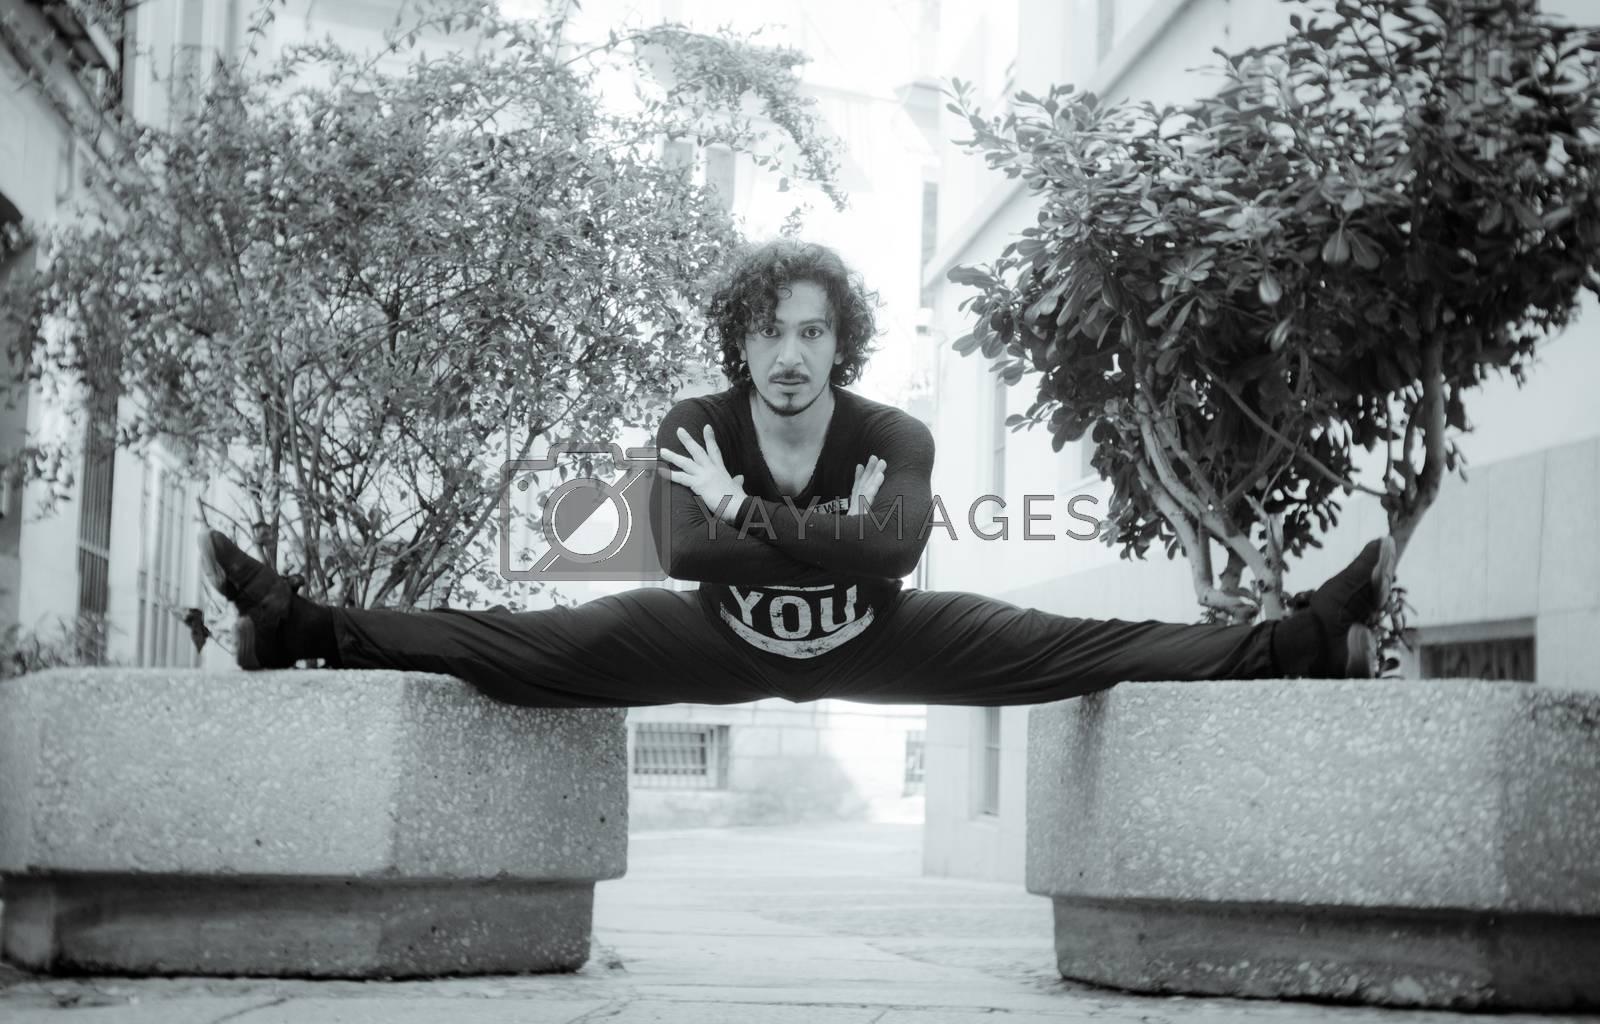 Male dancer in ballet pose by GemaIbarra